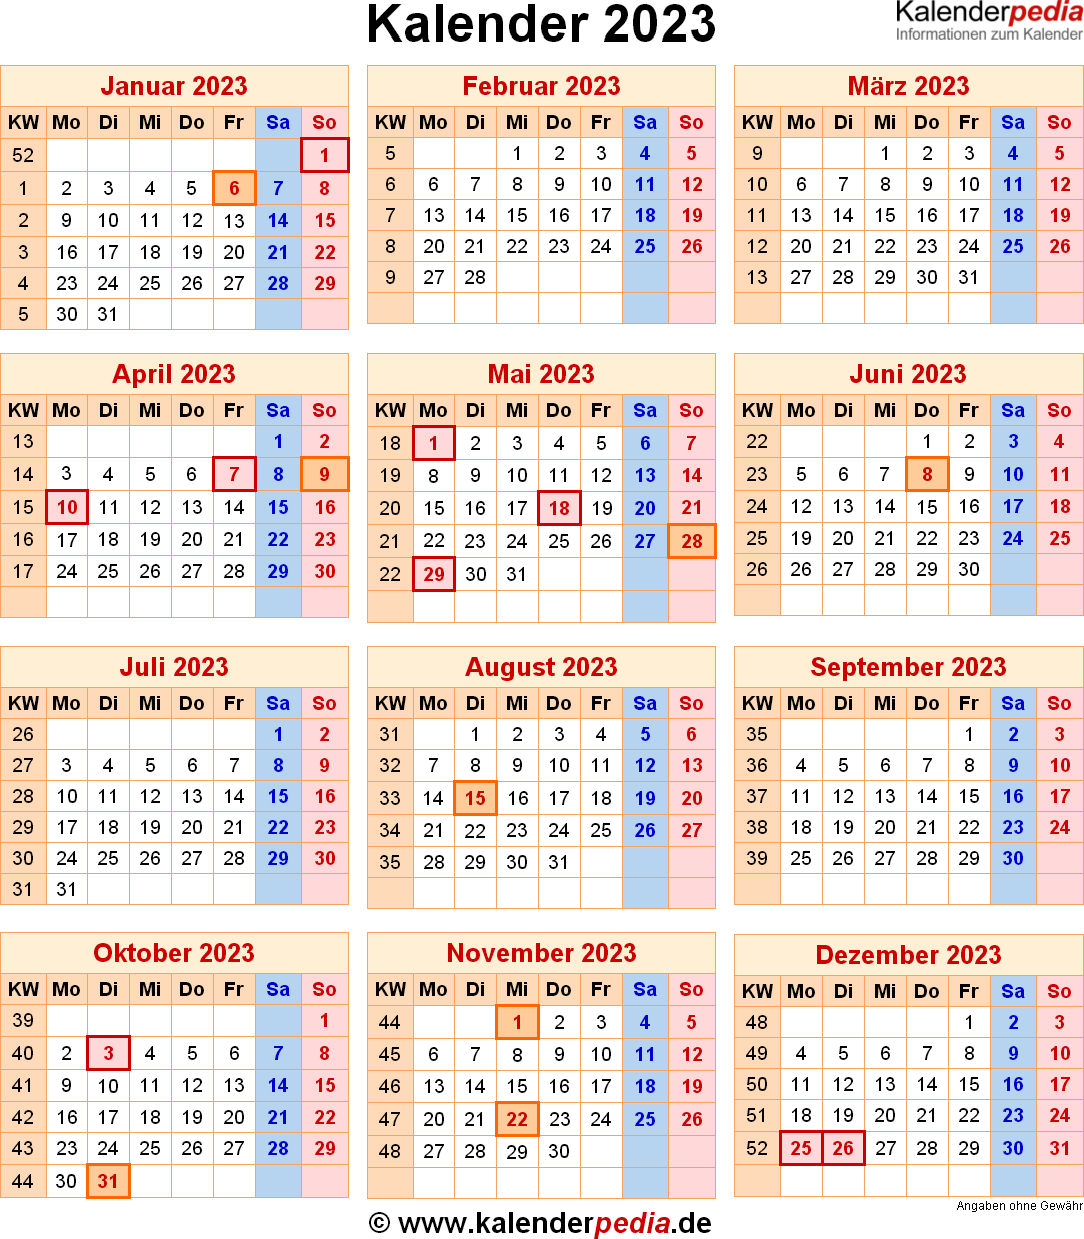 Kalender 2023